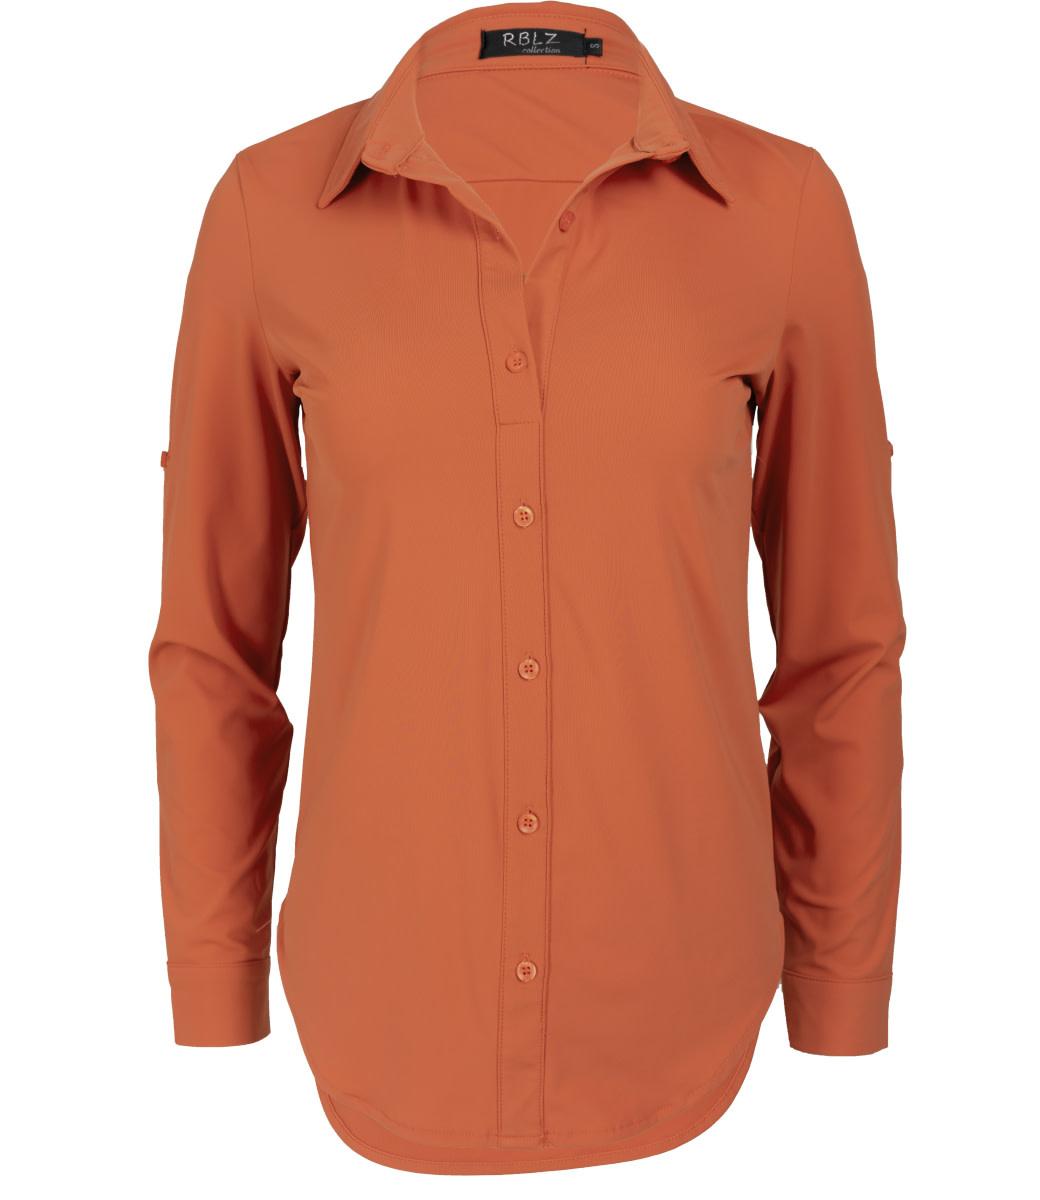 Rebelz Collection Blouse donker oranje travel Lil